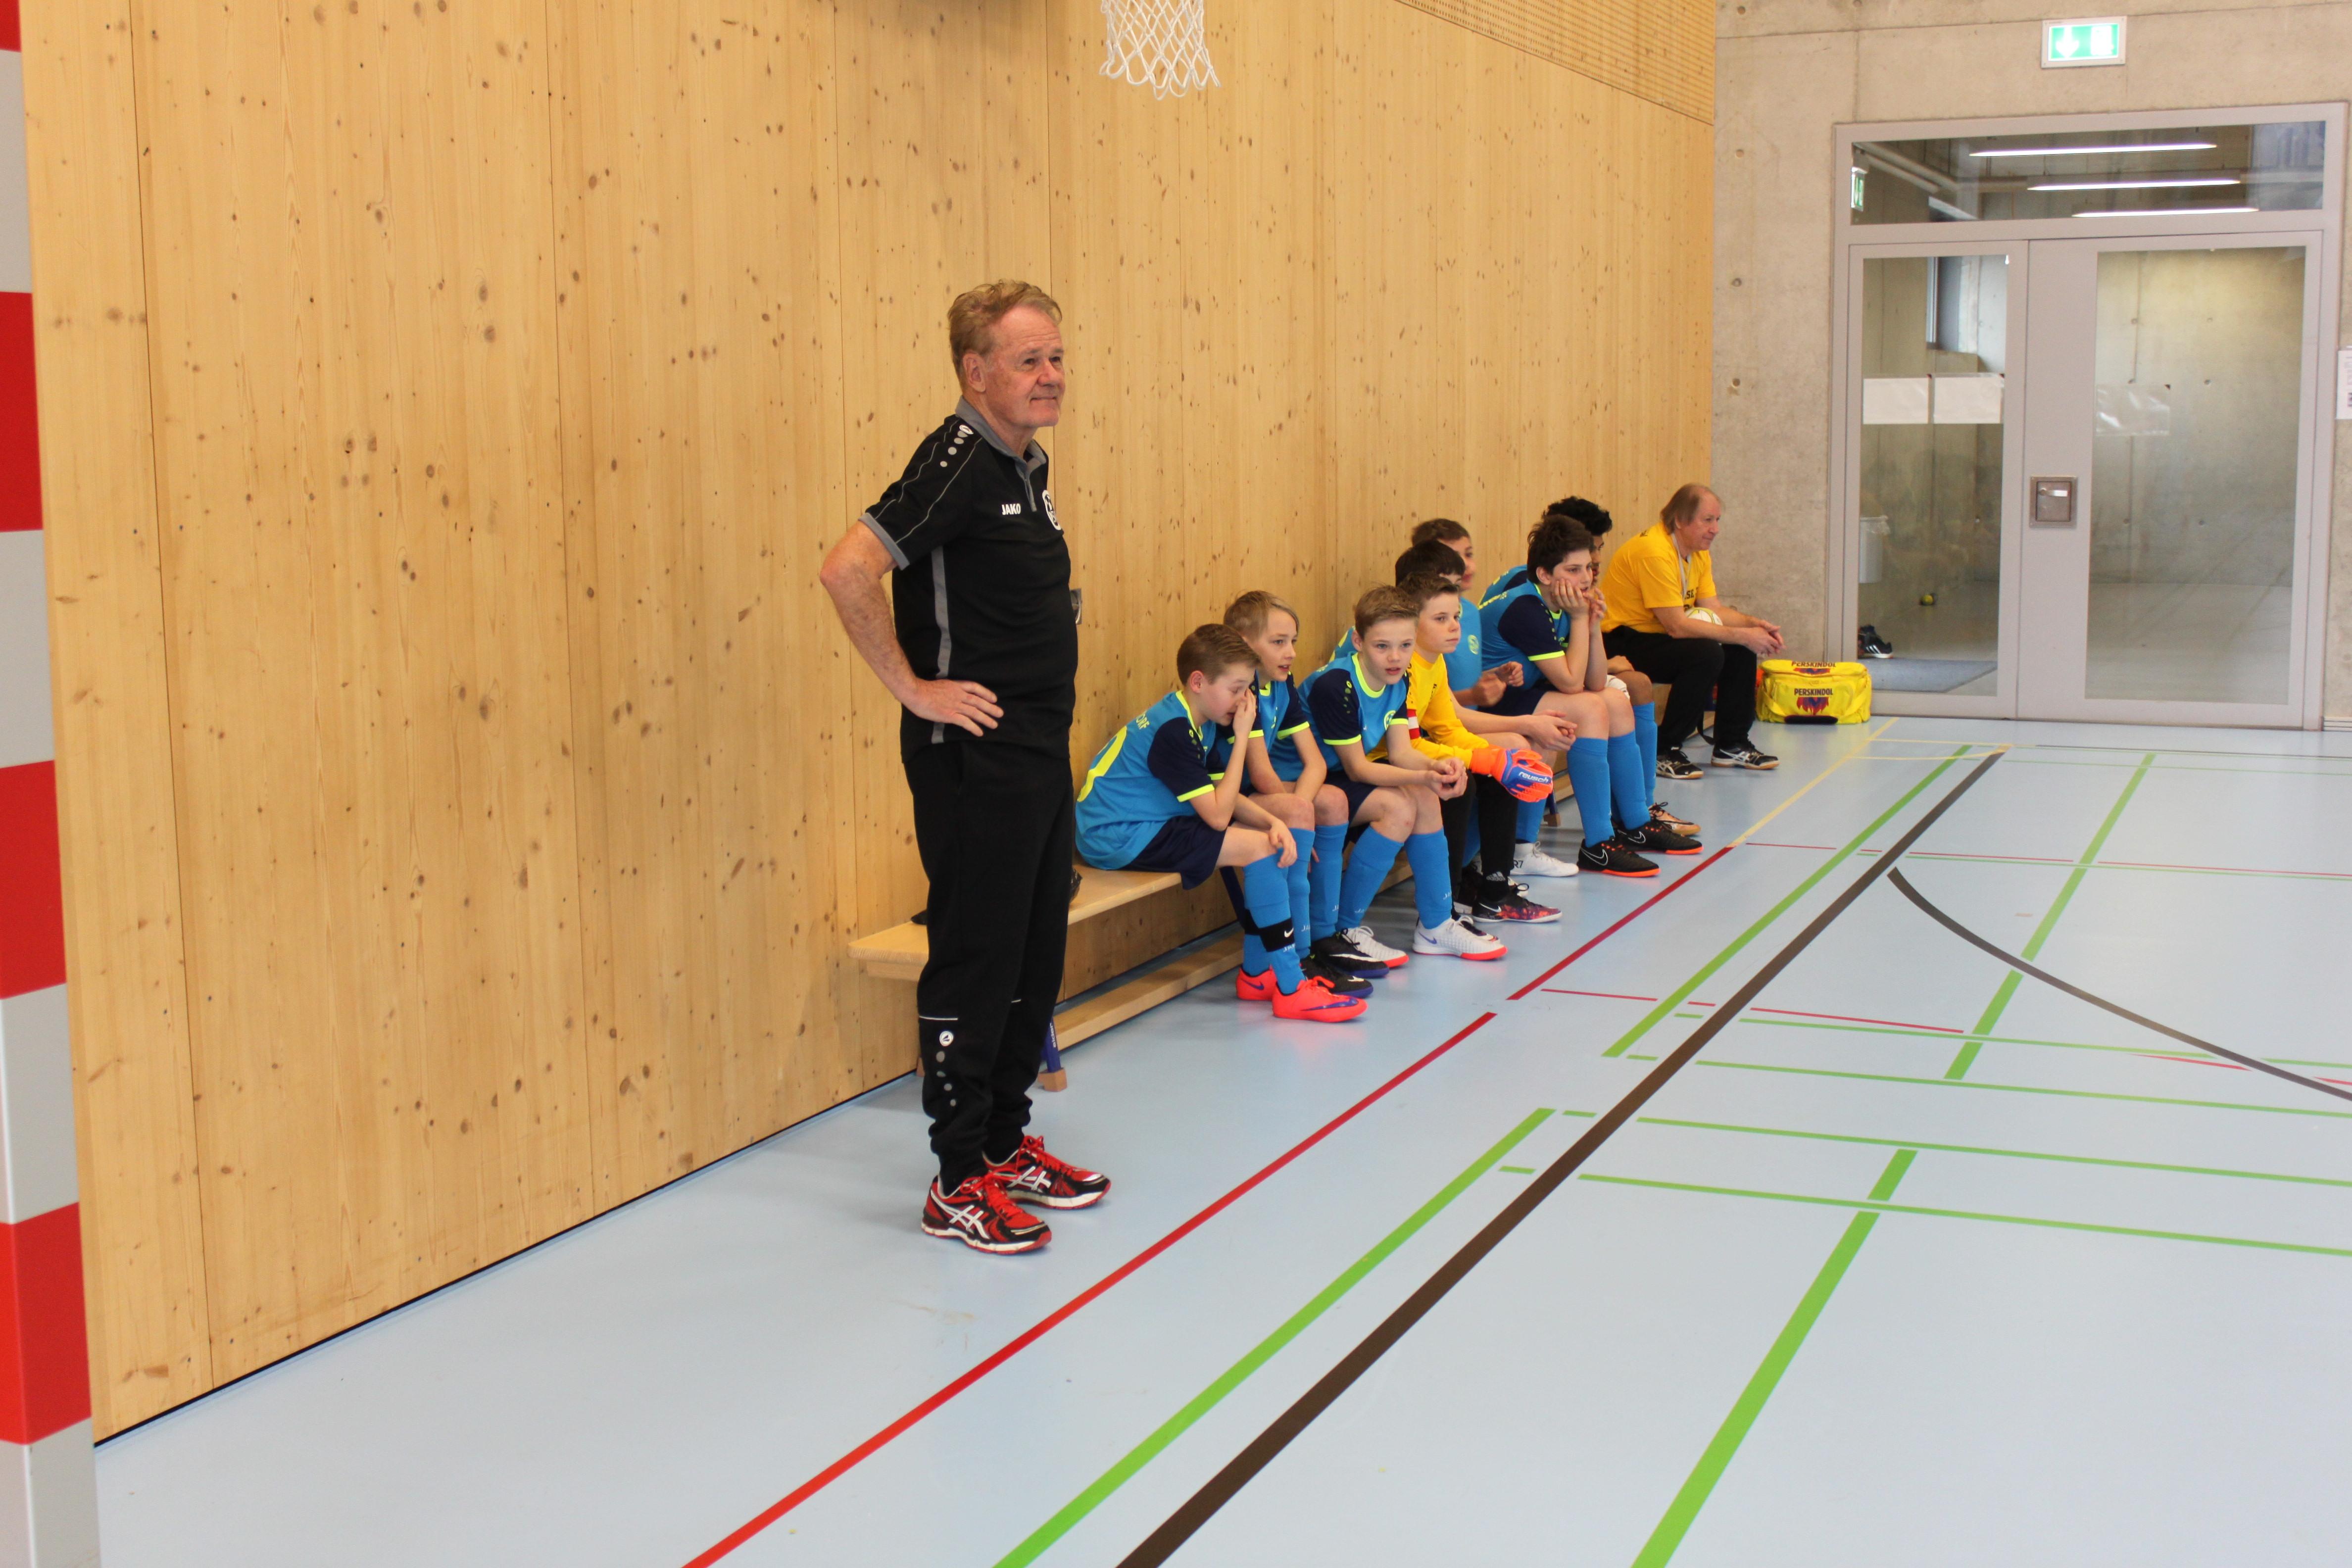 SVK Junioren-Hallenturnier 2018